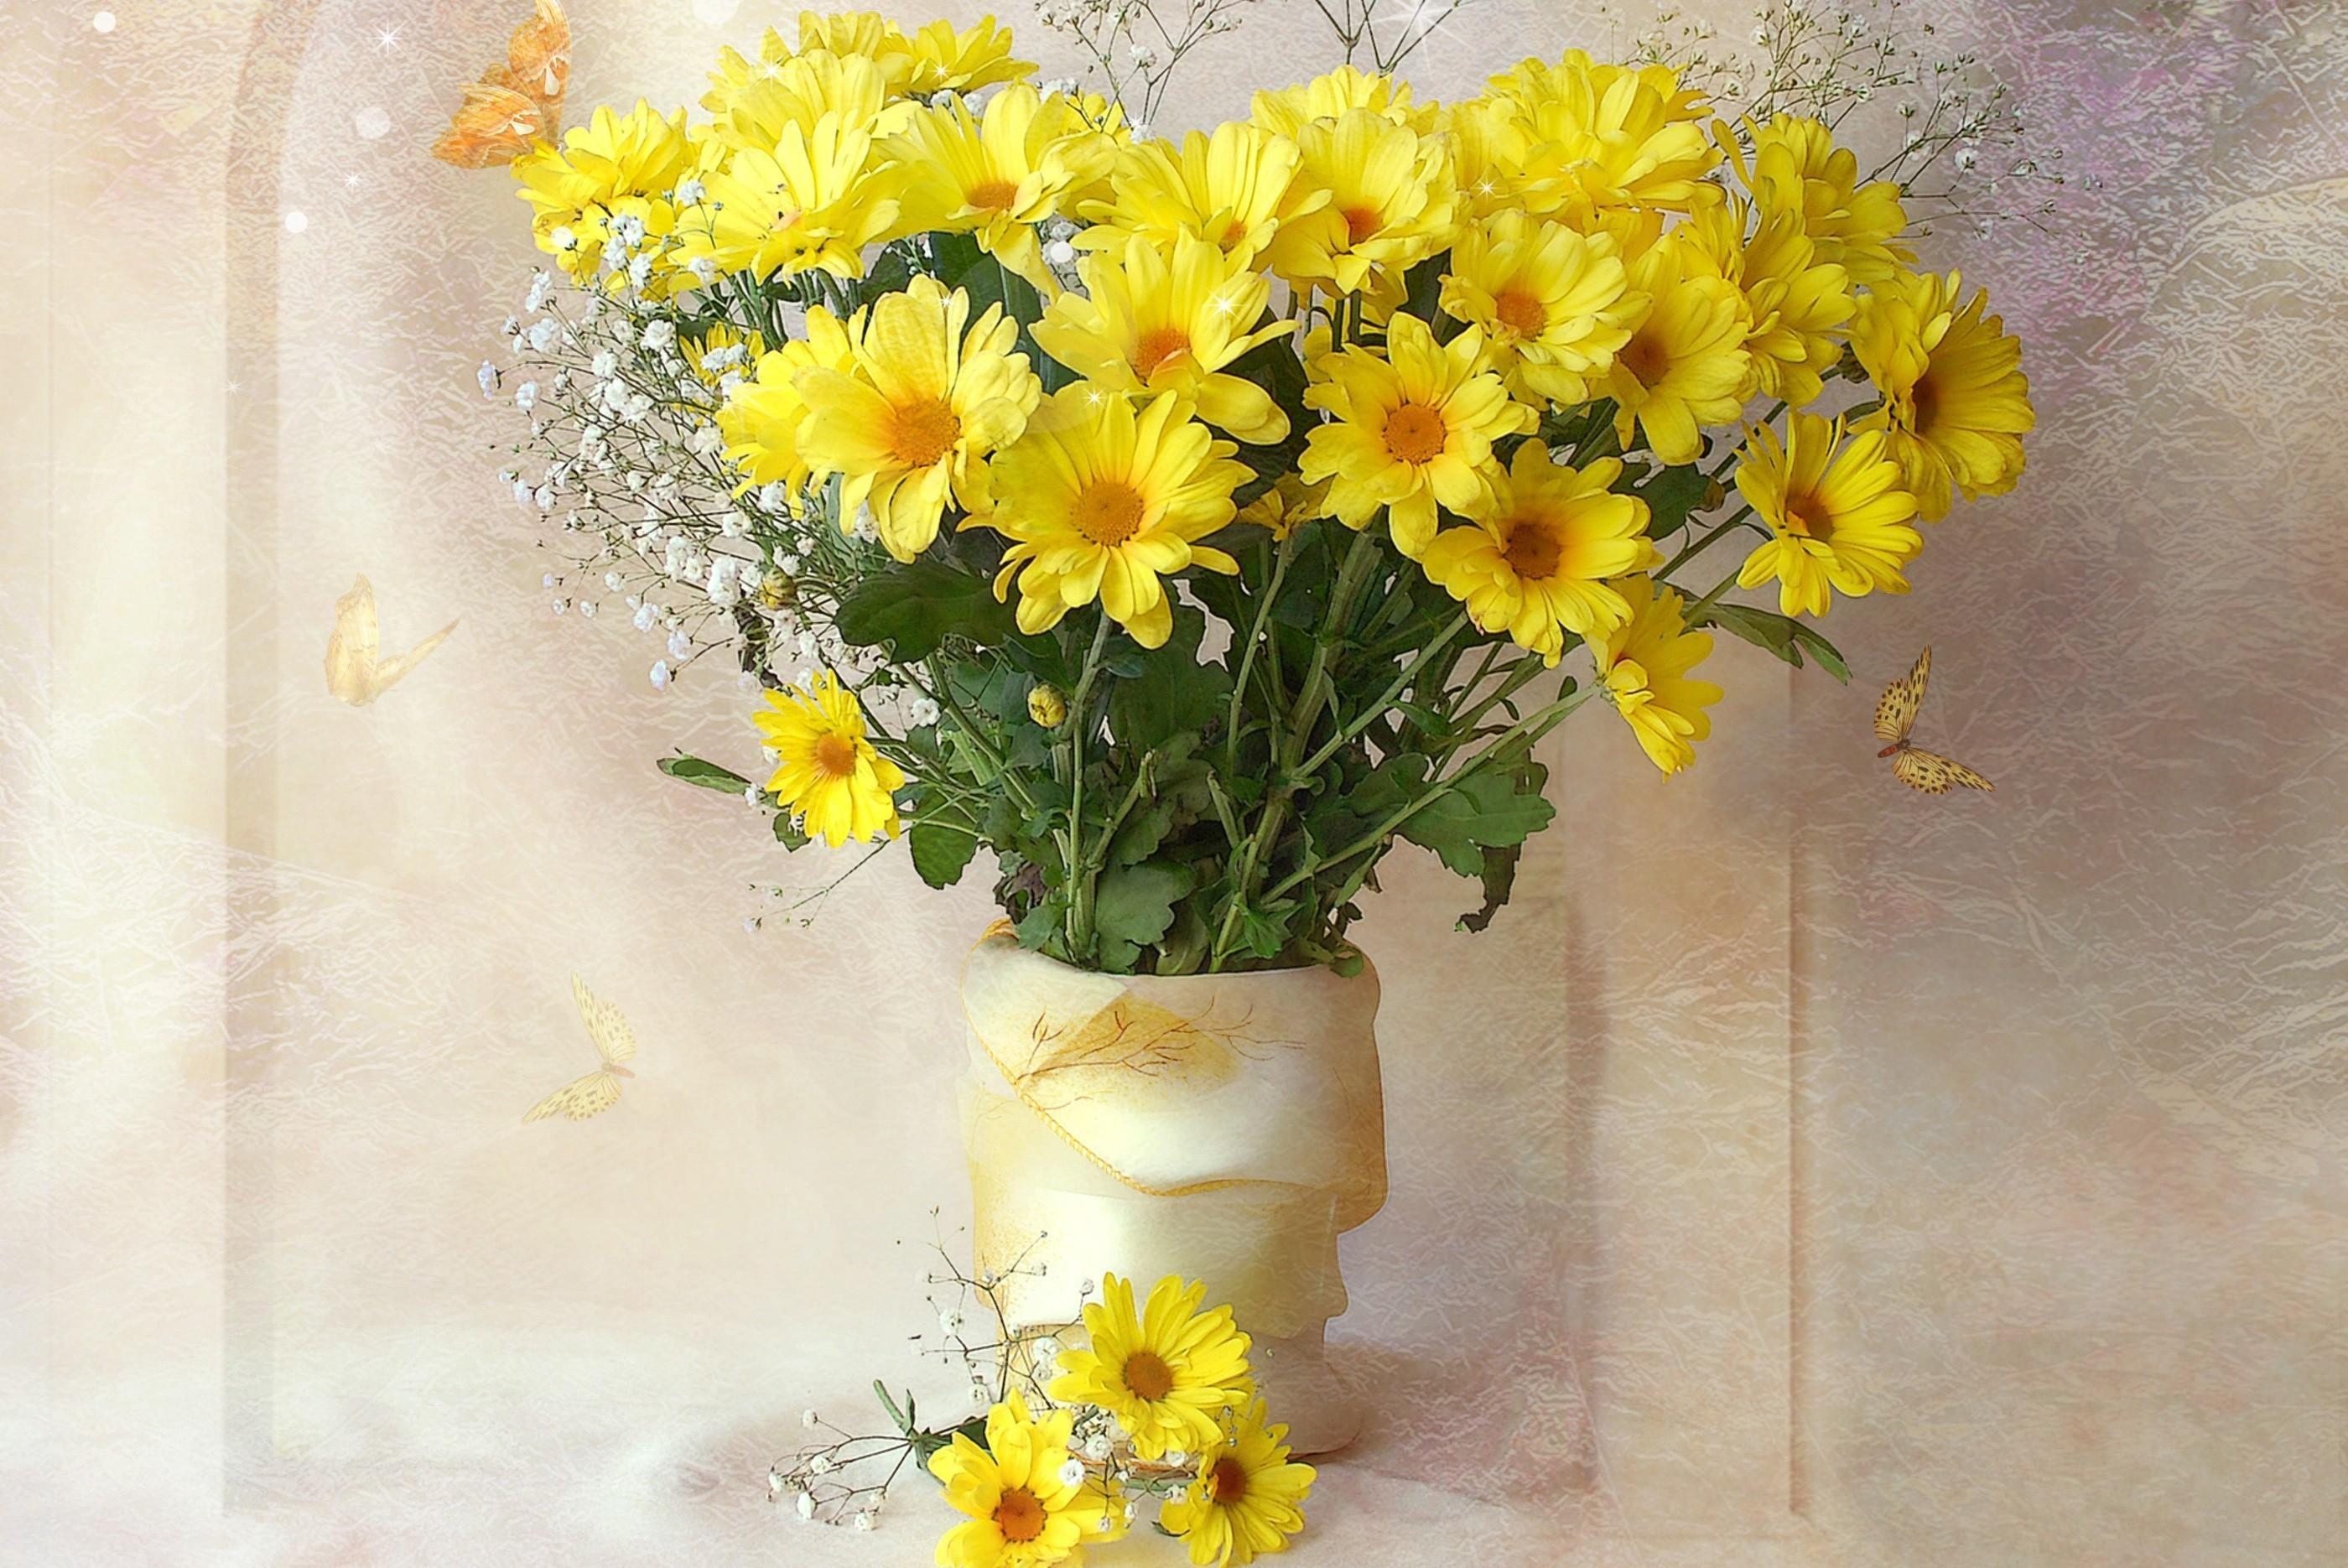 Wallpaper : painting, yellow, bouquets, chrysanthemums, flora, petal ...